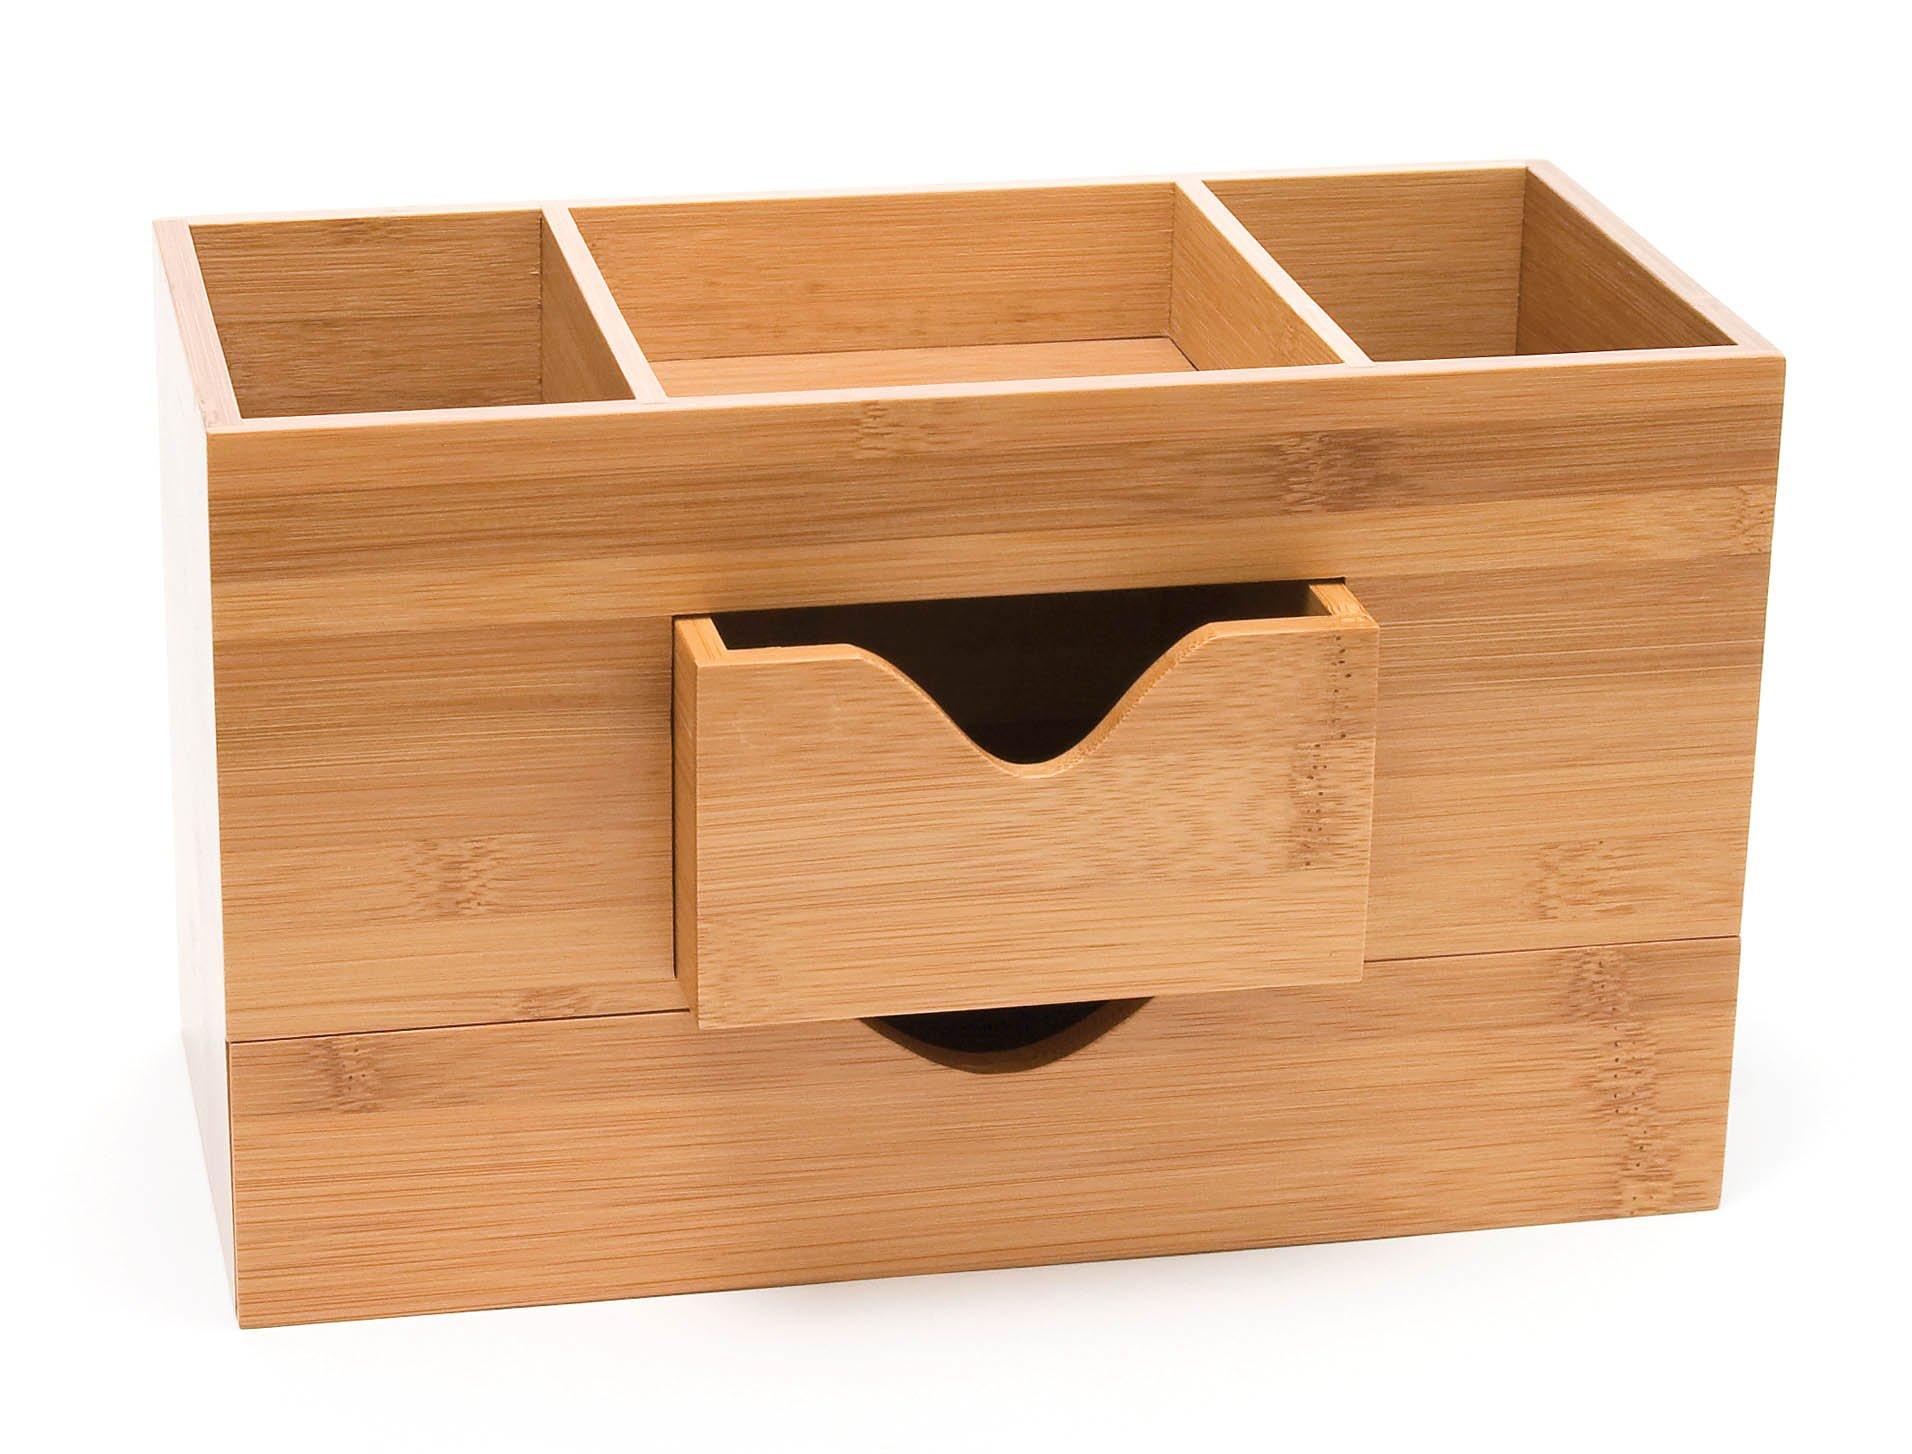 Lipper International 1803 Bamboo Wood 3-Tier Desk and Office Supply Organizer, 9 1/2'' x 4 5/8'' x 5 3/4''